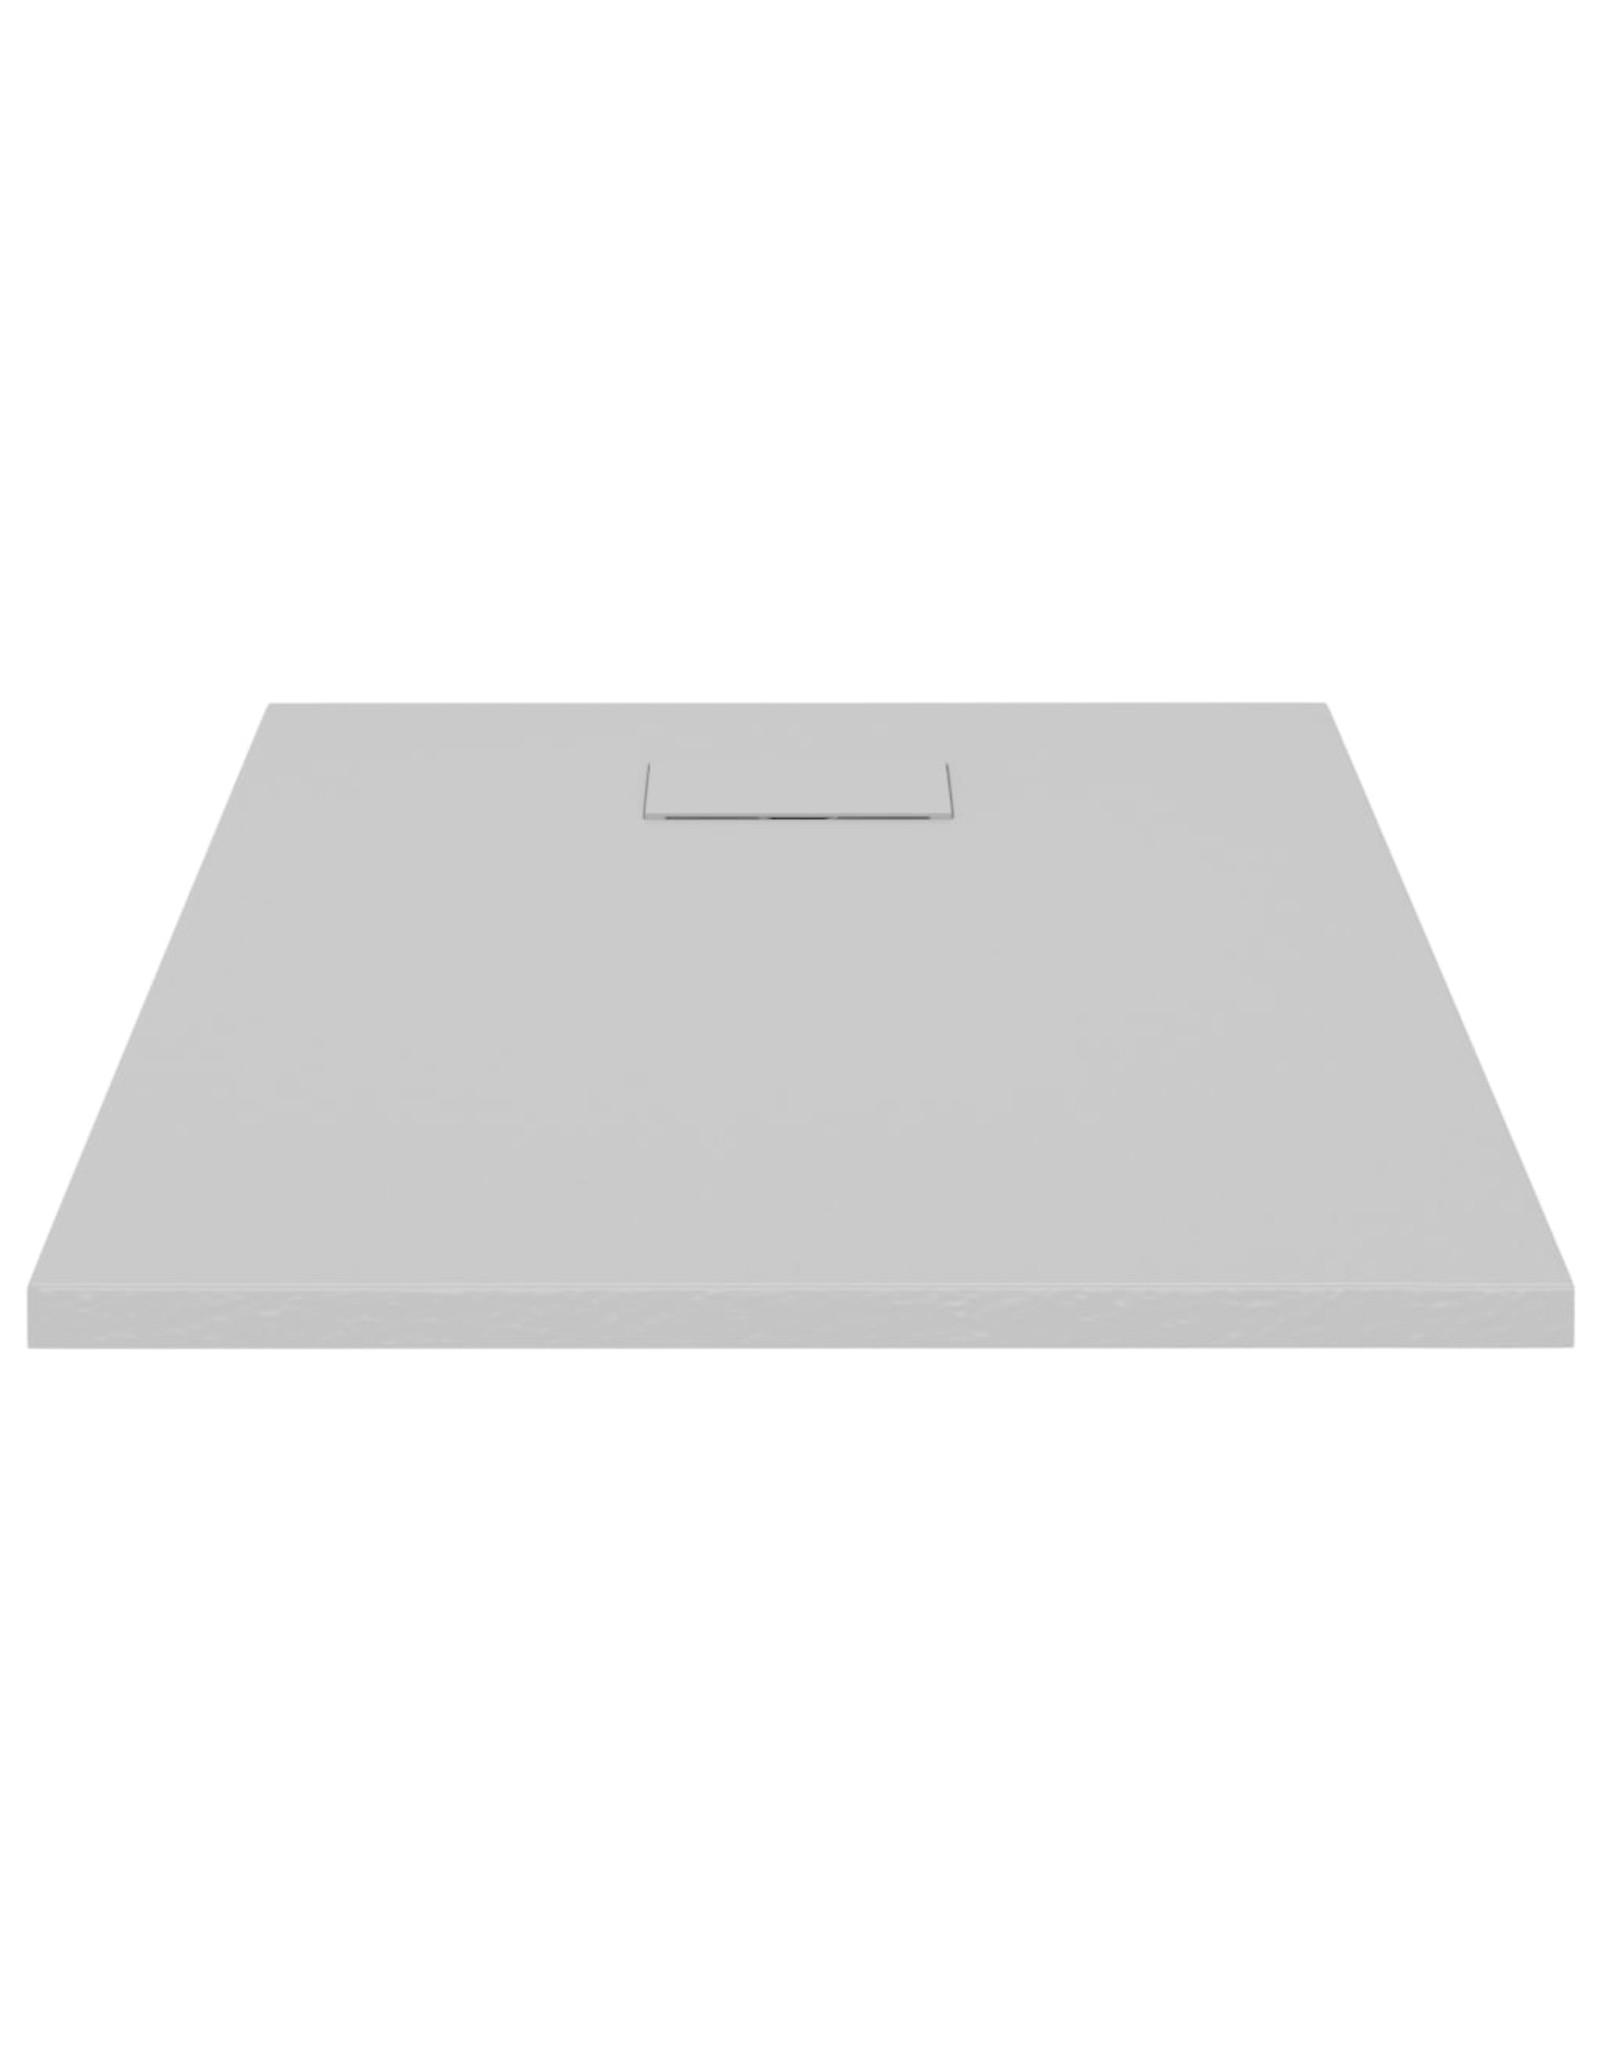 Douchebak 90x70 cm SMC grijs